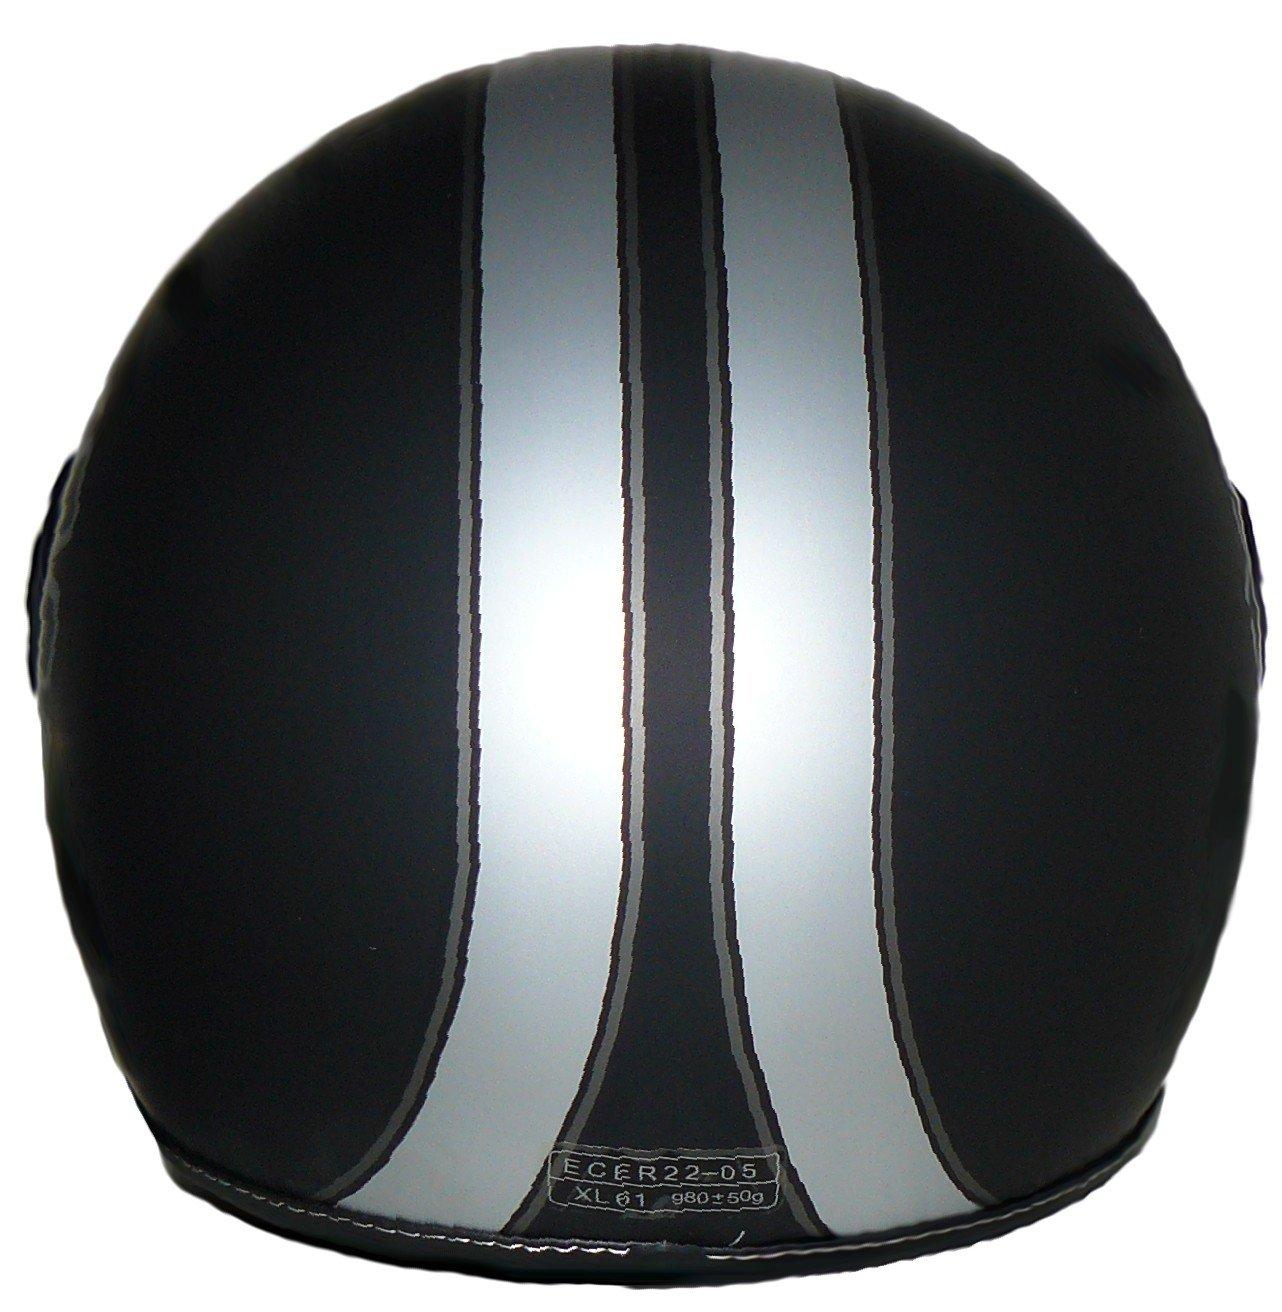 Protectwear Jethelm Motorradhelm im Pilotendesign H710-Streifen XL